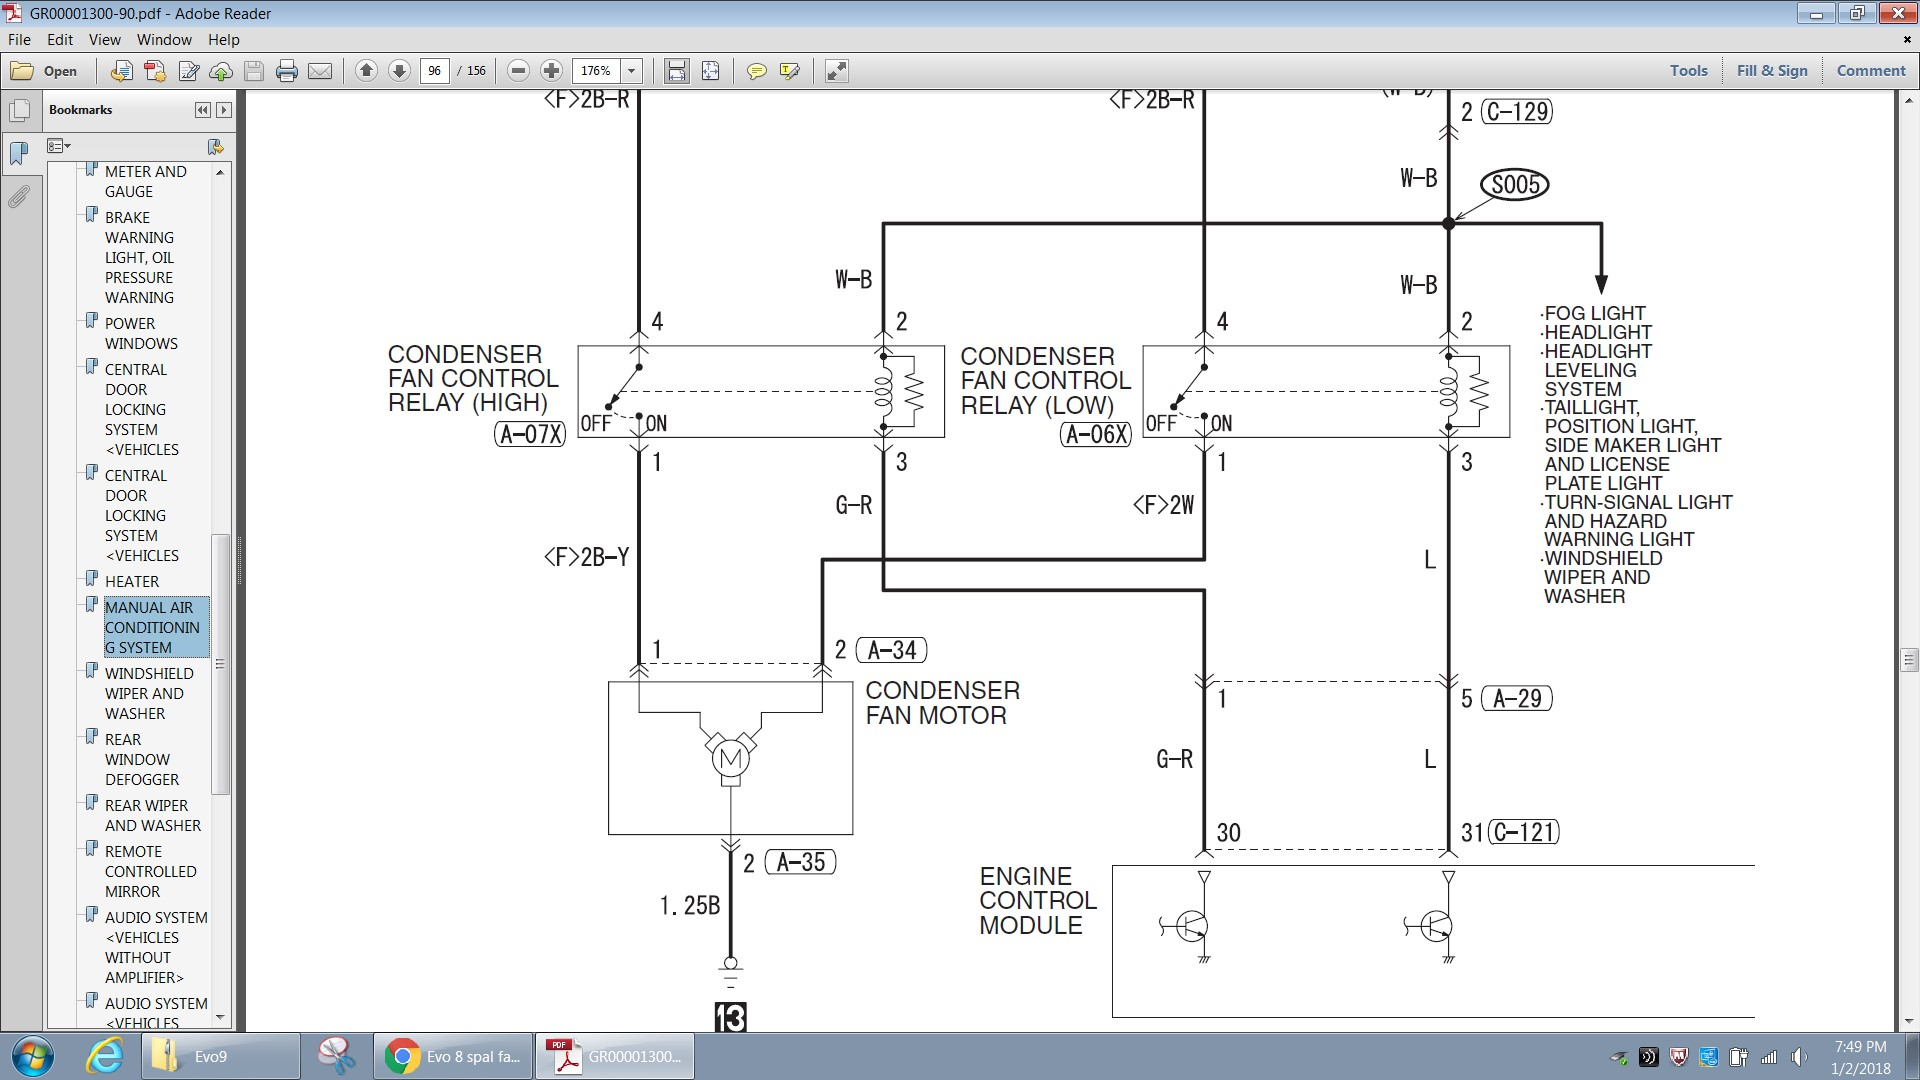 NK_3048] Wiring Diagram Evo 8 Vacuum Diagram Evo 8 Ecu Wiring Diagram 2004Www Mohammedshrine Librar Wiring 101